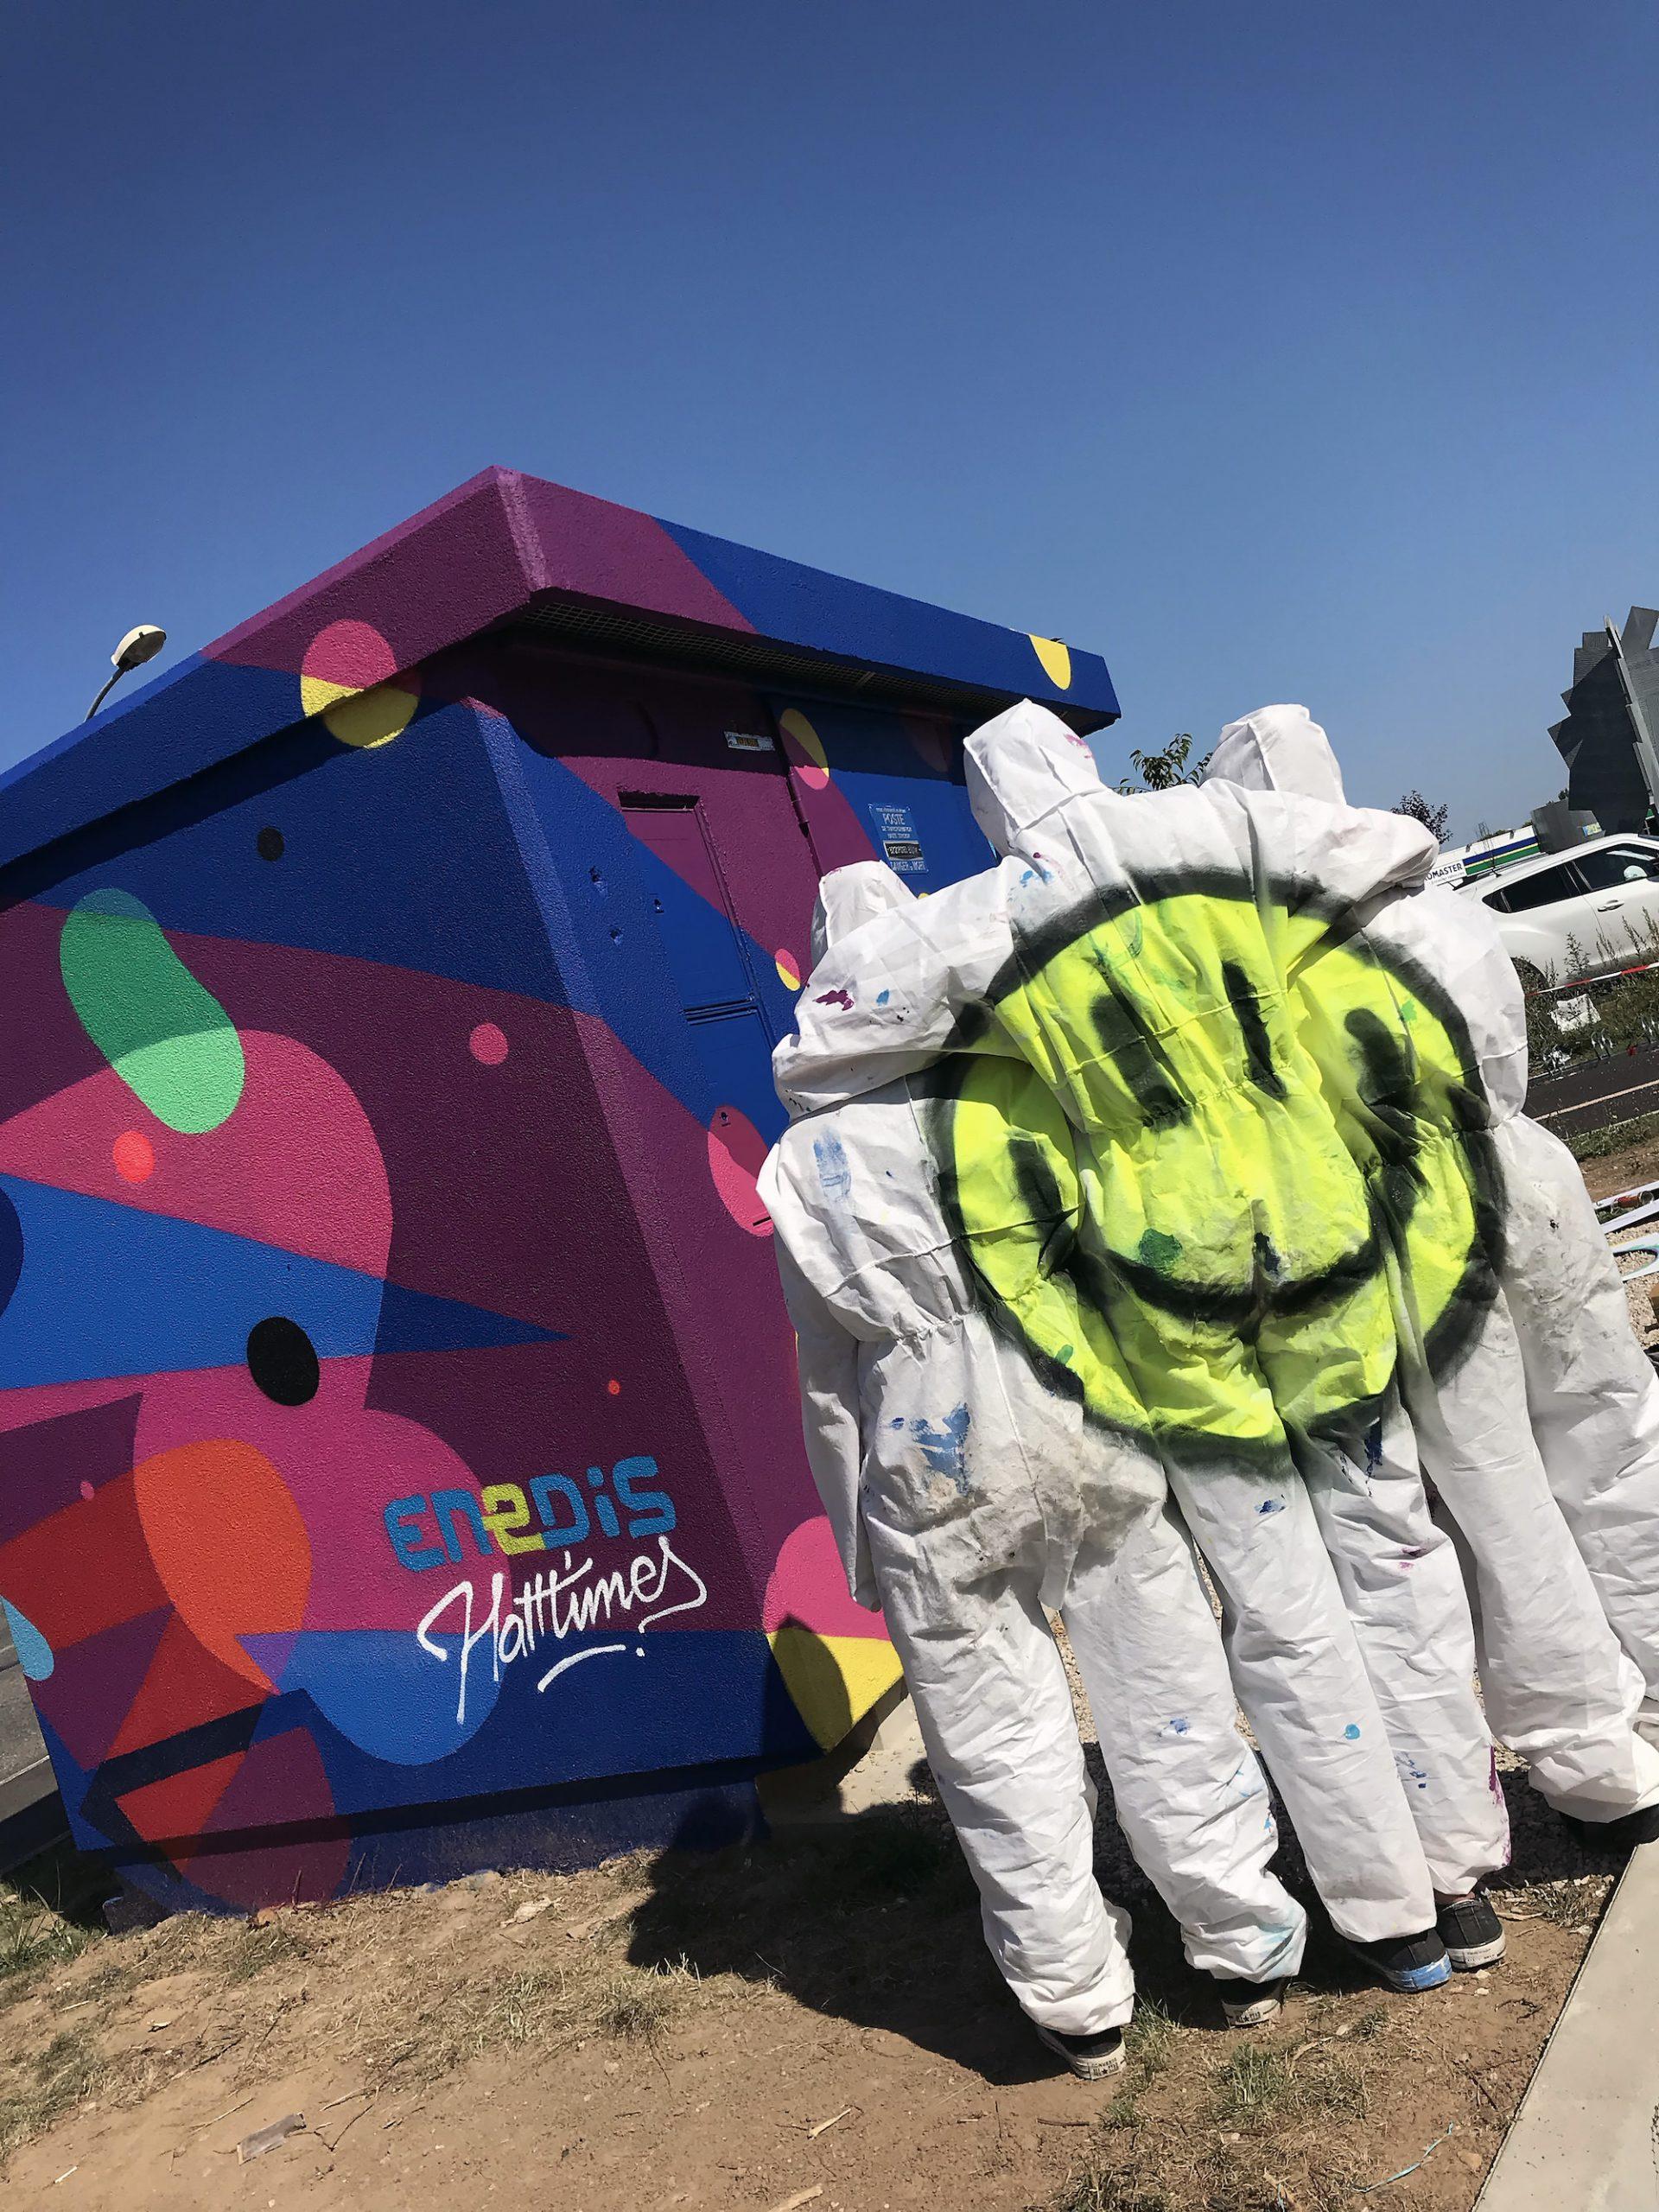 Transformateur graffiti chantier jeunes initiation graffeur montauban atelier